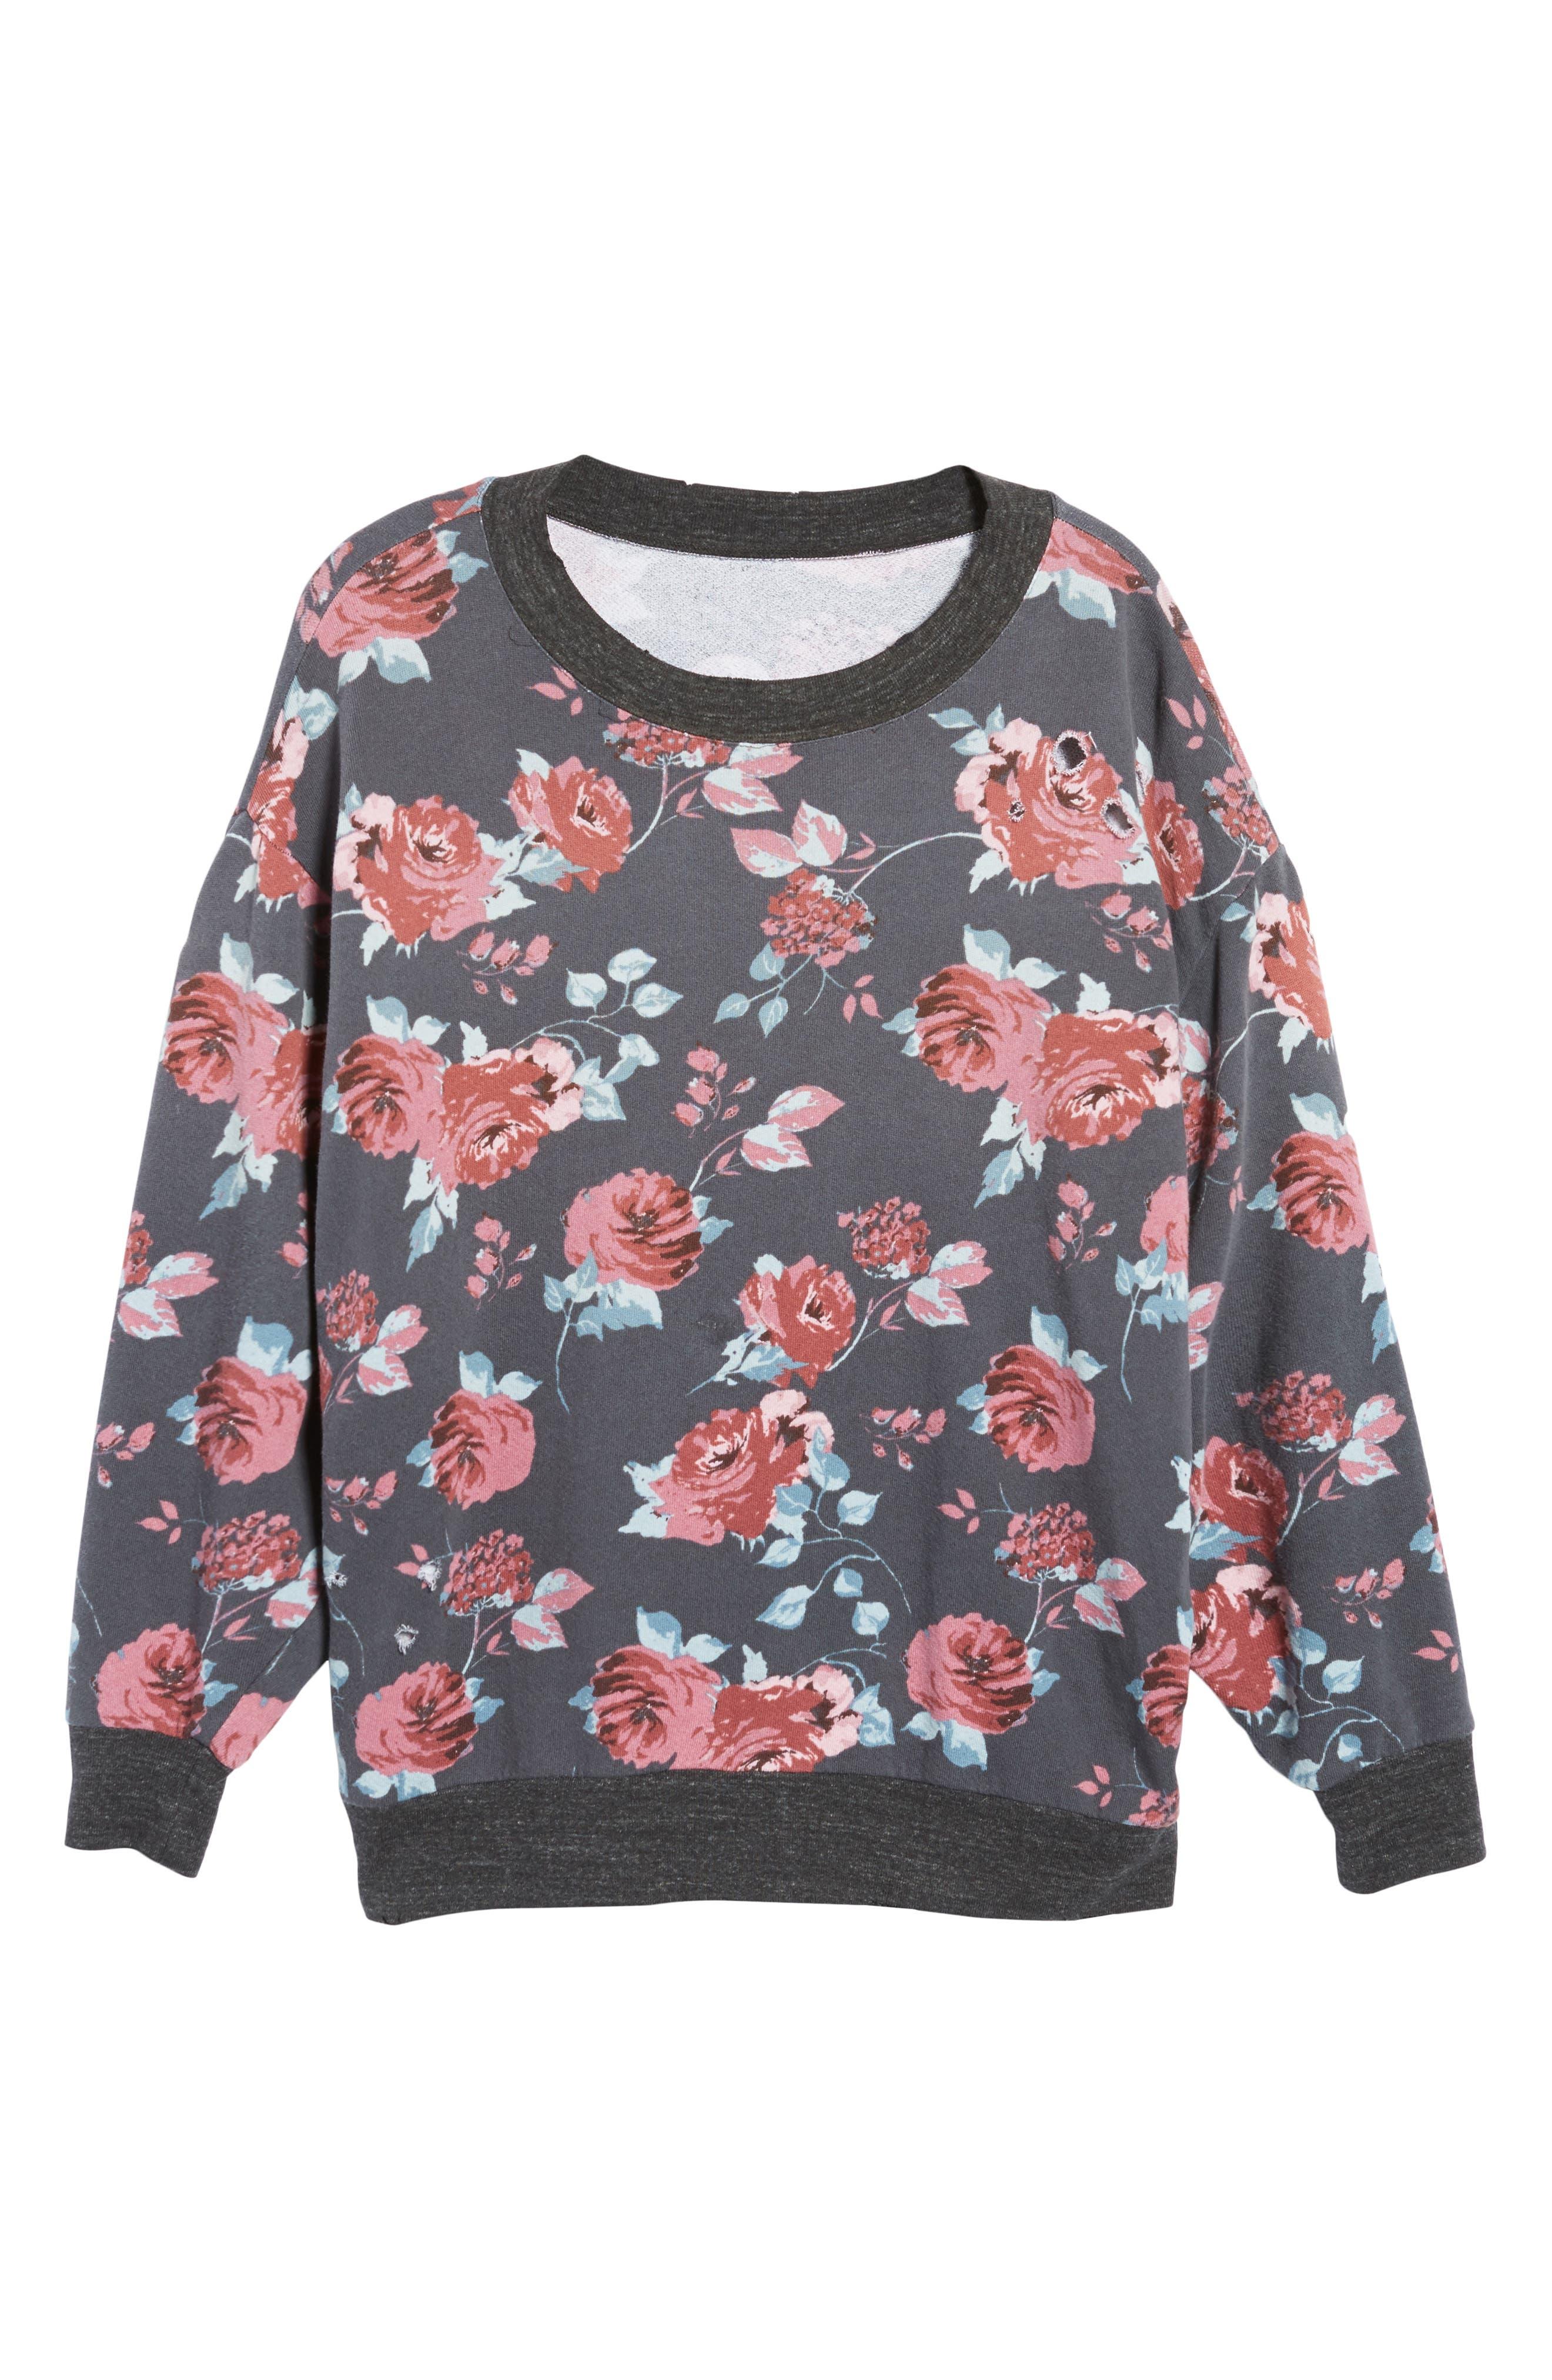 Chelsea Sweatshirt,                             Alternate thumbnail 6, color,                             Pitch Black